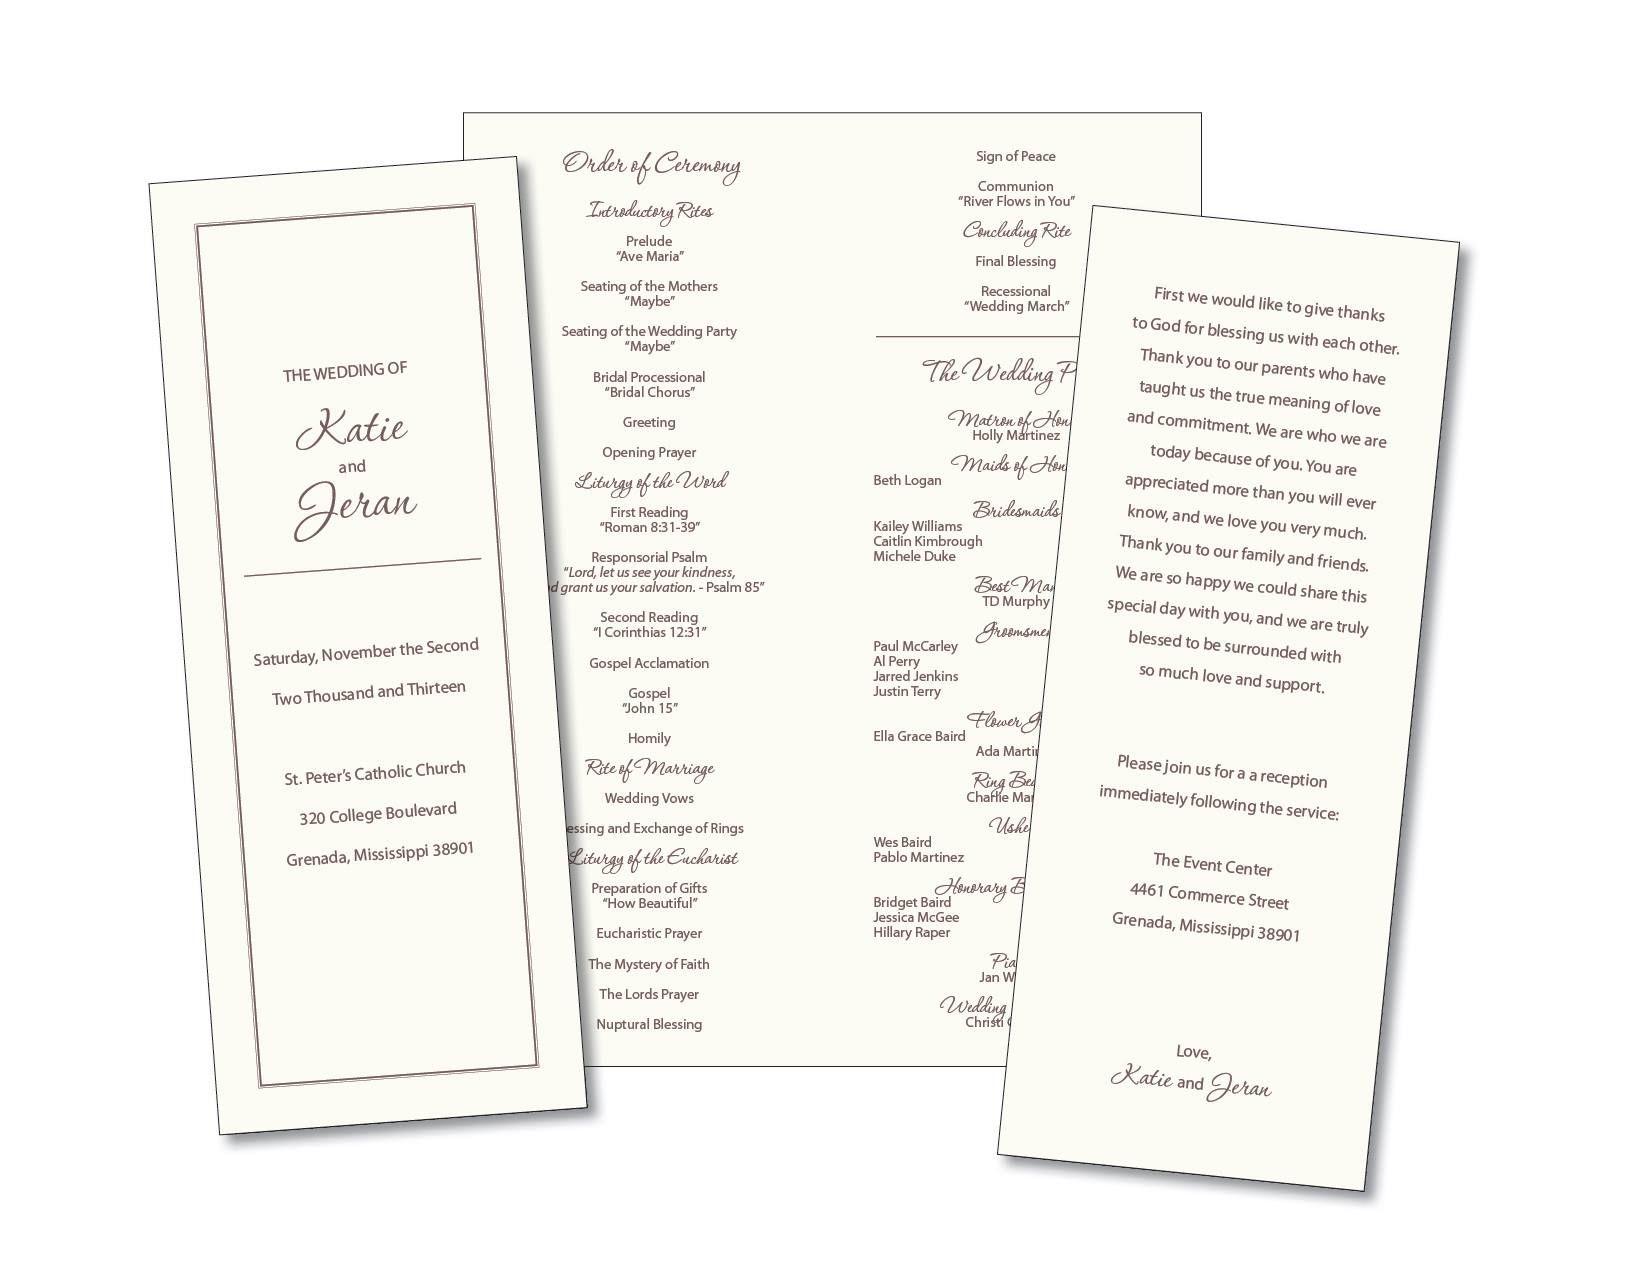 Free Diy Catholic Wedding Program Ai Template I M A Professional Graphic Designer Wedding Program Template Free Catholic Wedding Program Diy Wedding Programs